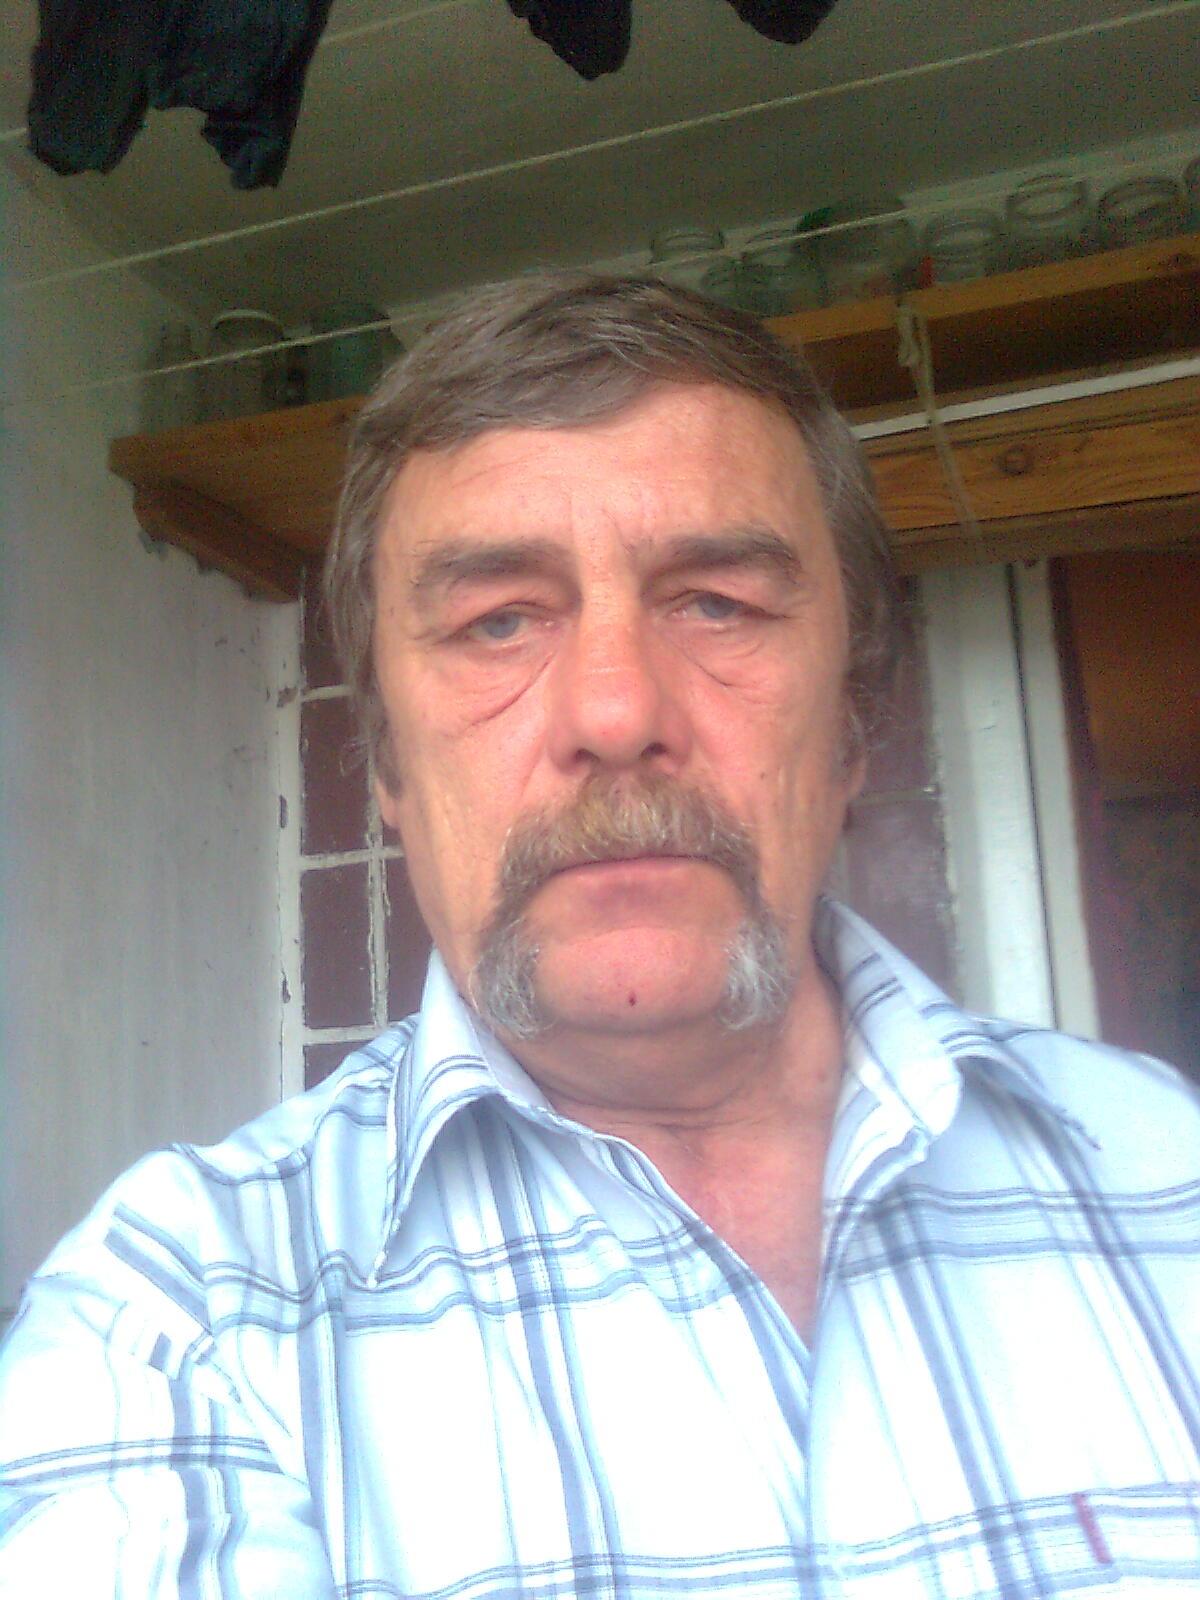 чат знакомств город челябинск